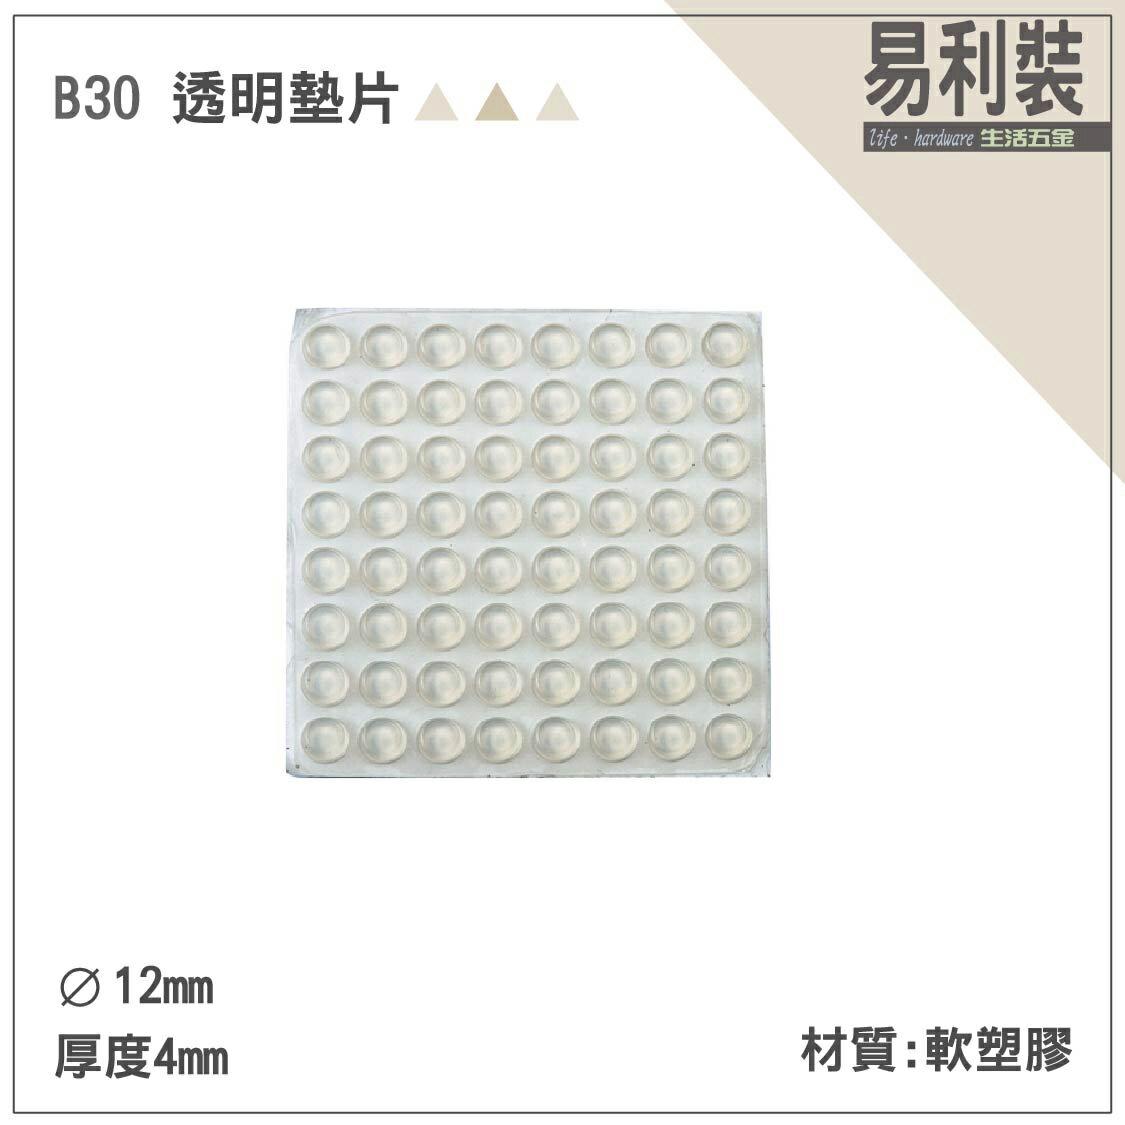 【 EASYCAN  】B30 透明墊片 1片64顆 易利裝生活五金 浴室 廚房 房間 臥房 衣櫃 小資族 辦公家具 系統家具 0